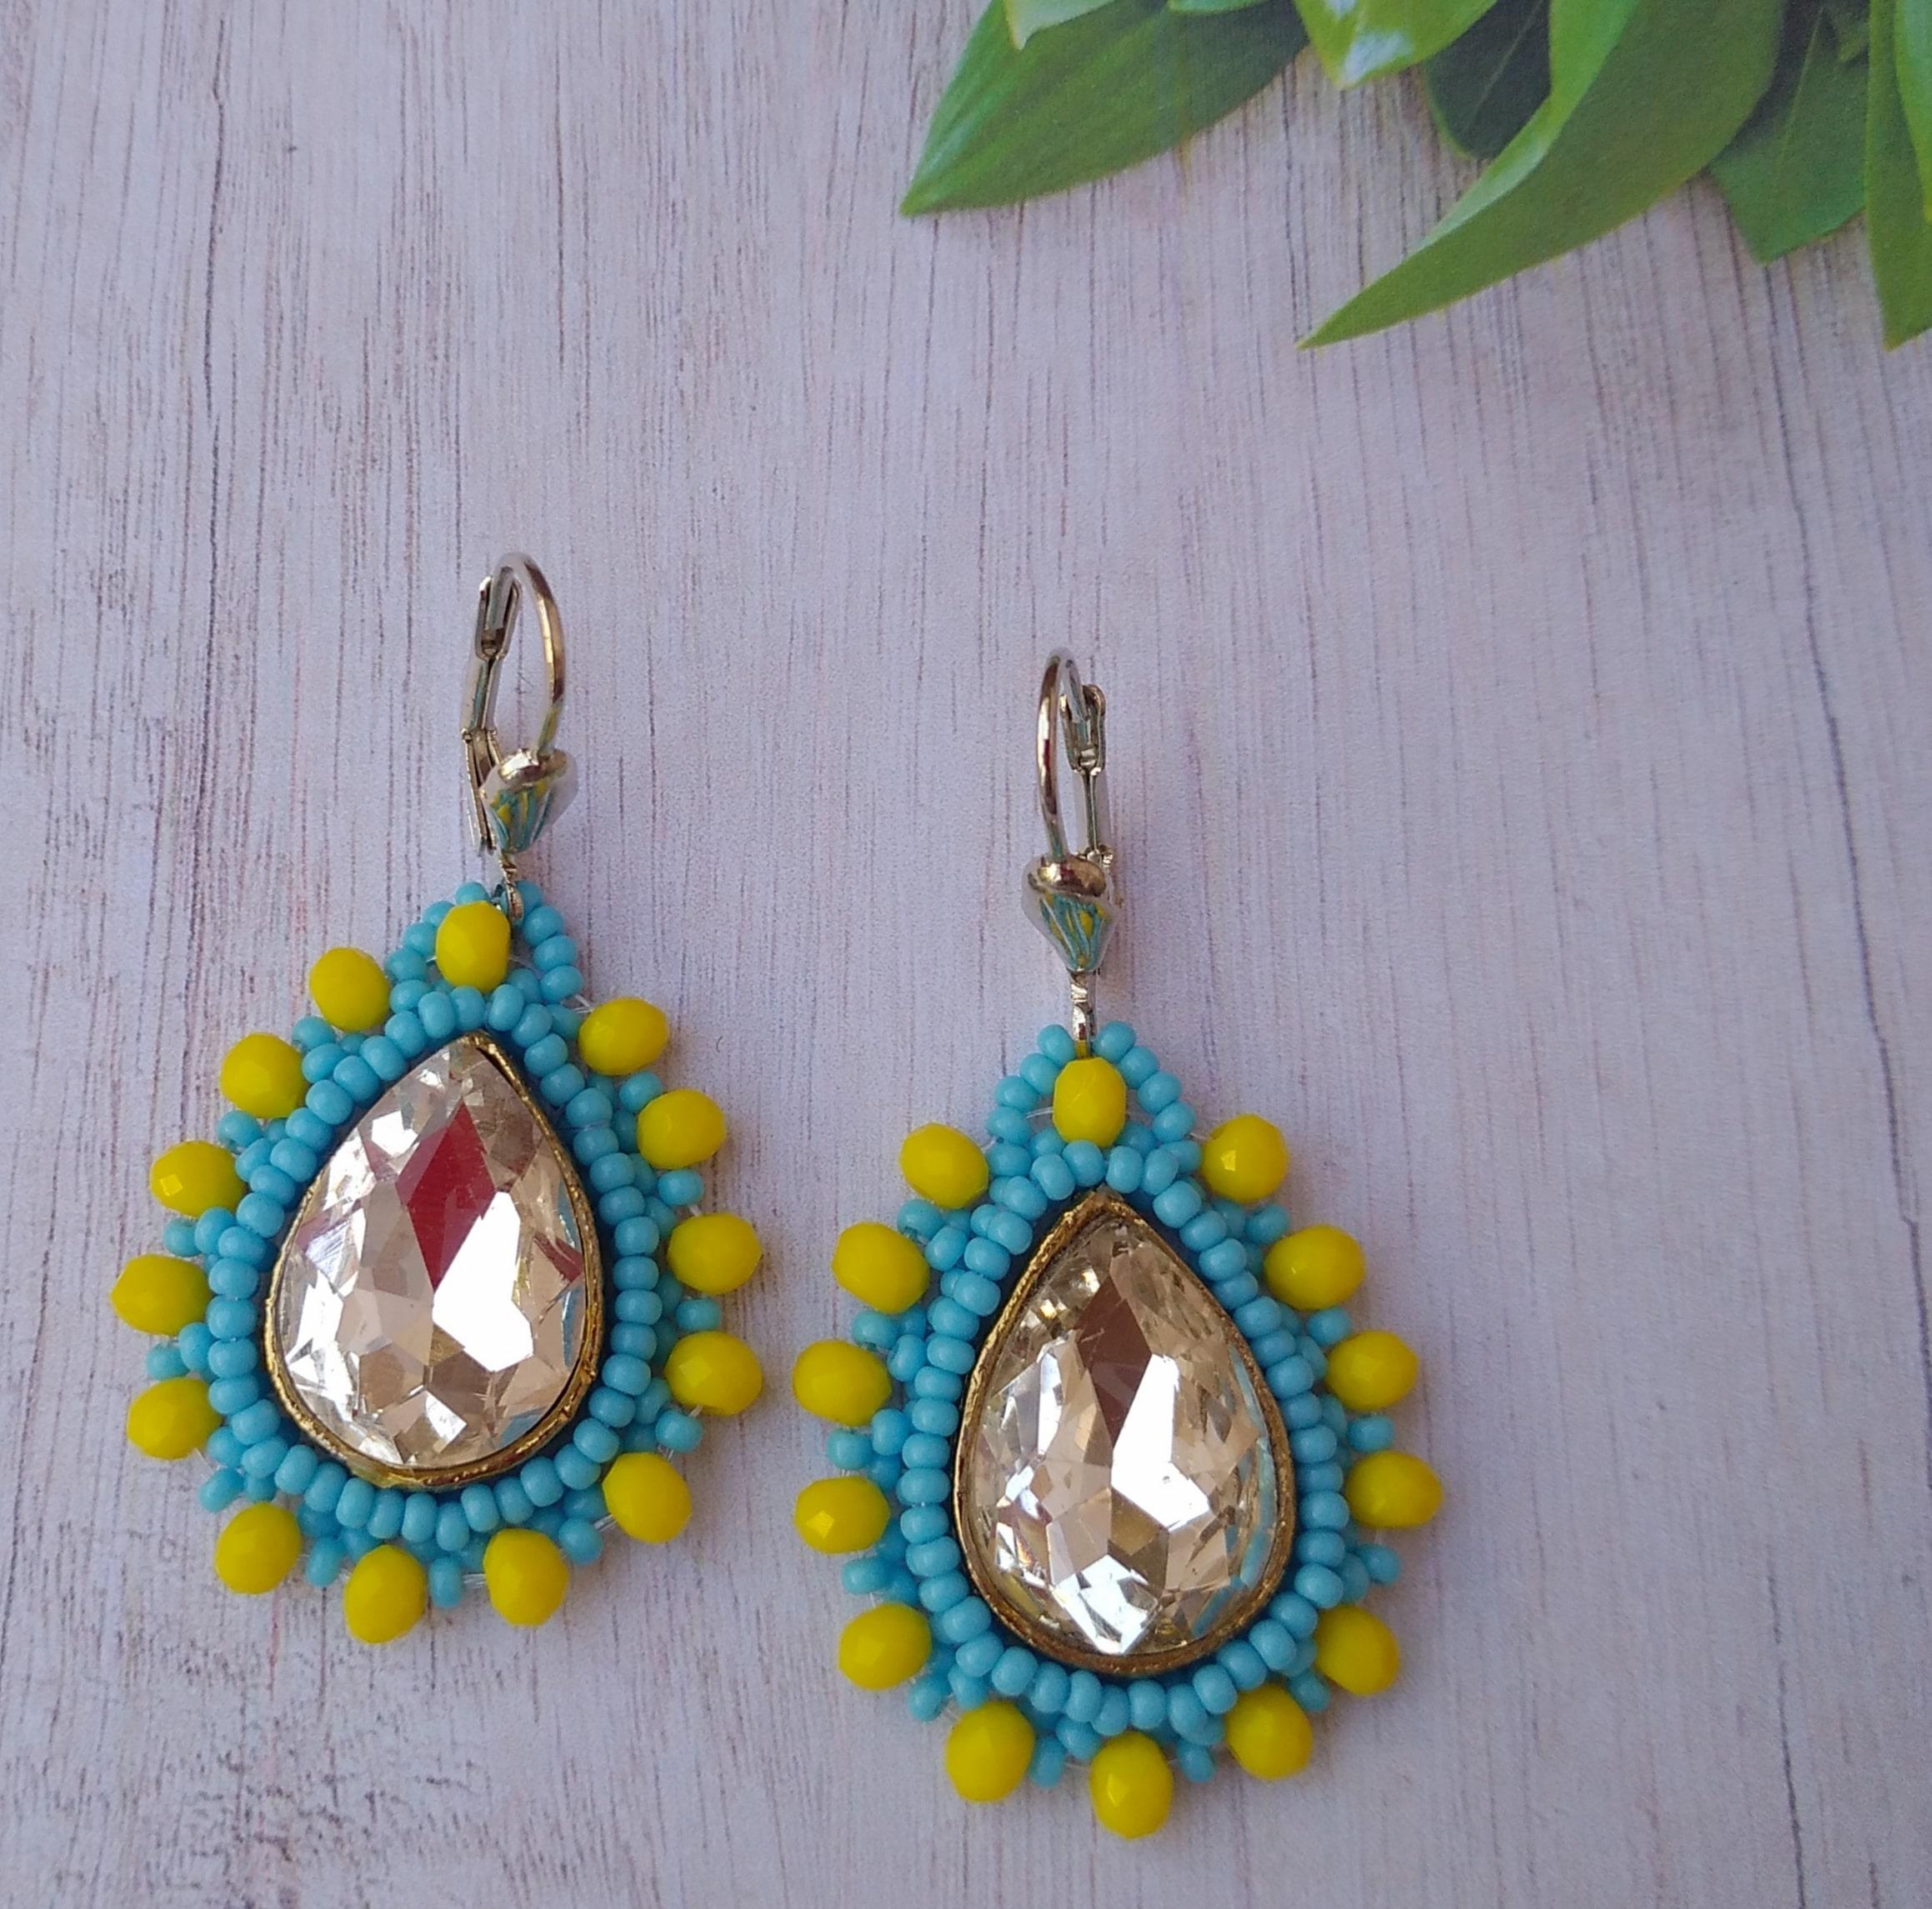 Women's Beaded Drop Earrings with Glittering Stone Work Slider Thumbnail 4/4